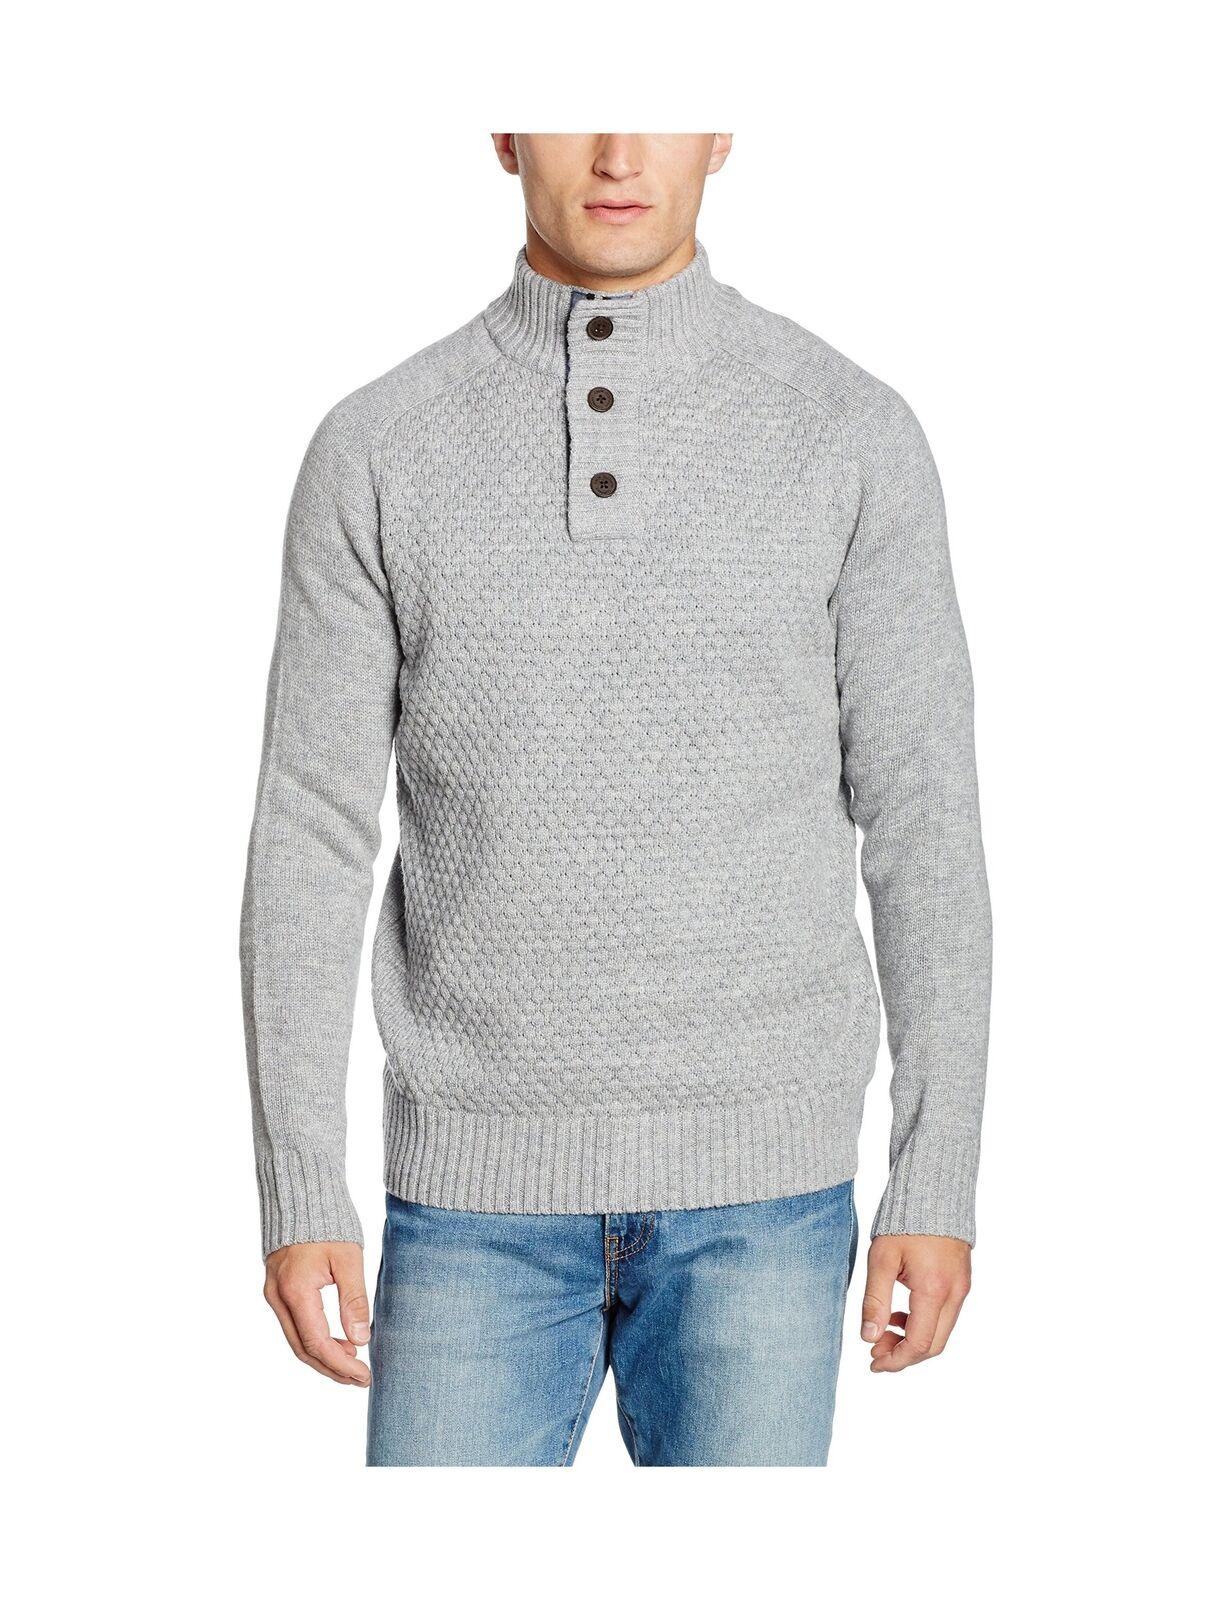 Crew Clothing uomo fonthill Maglione Grigio (Mid Grigio Marle) x-Large